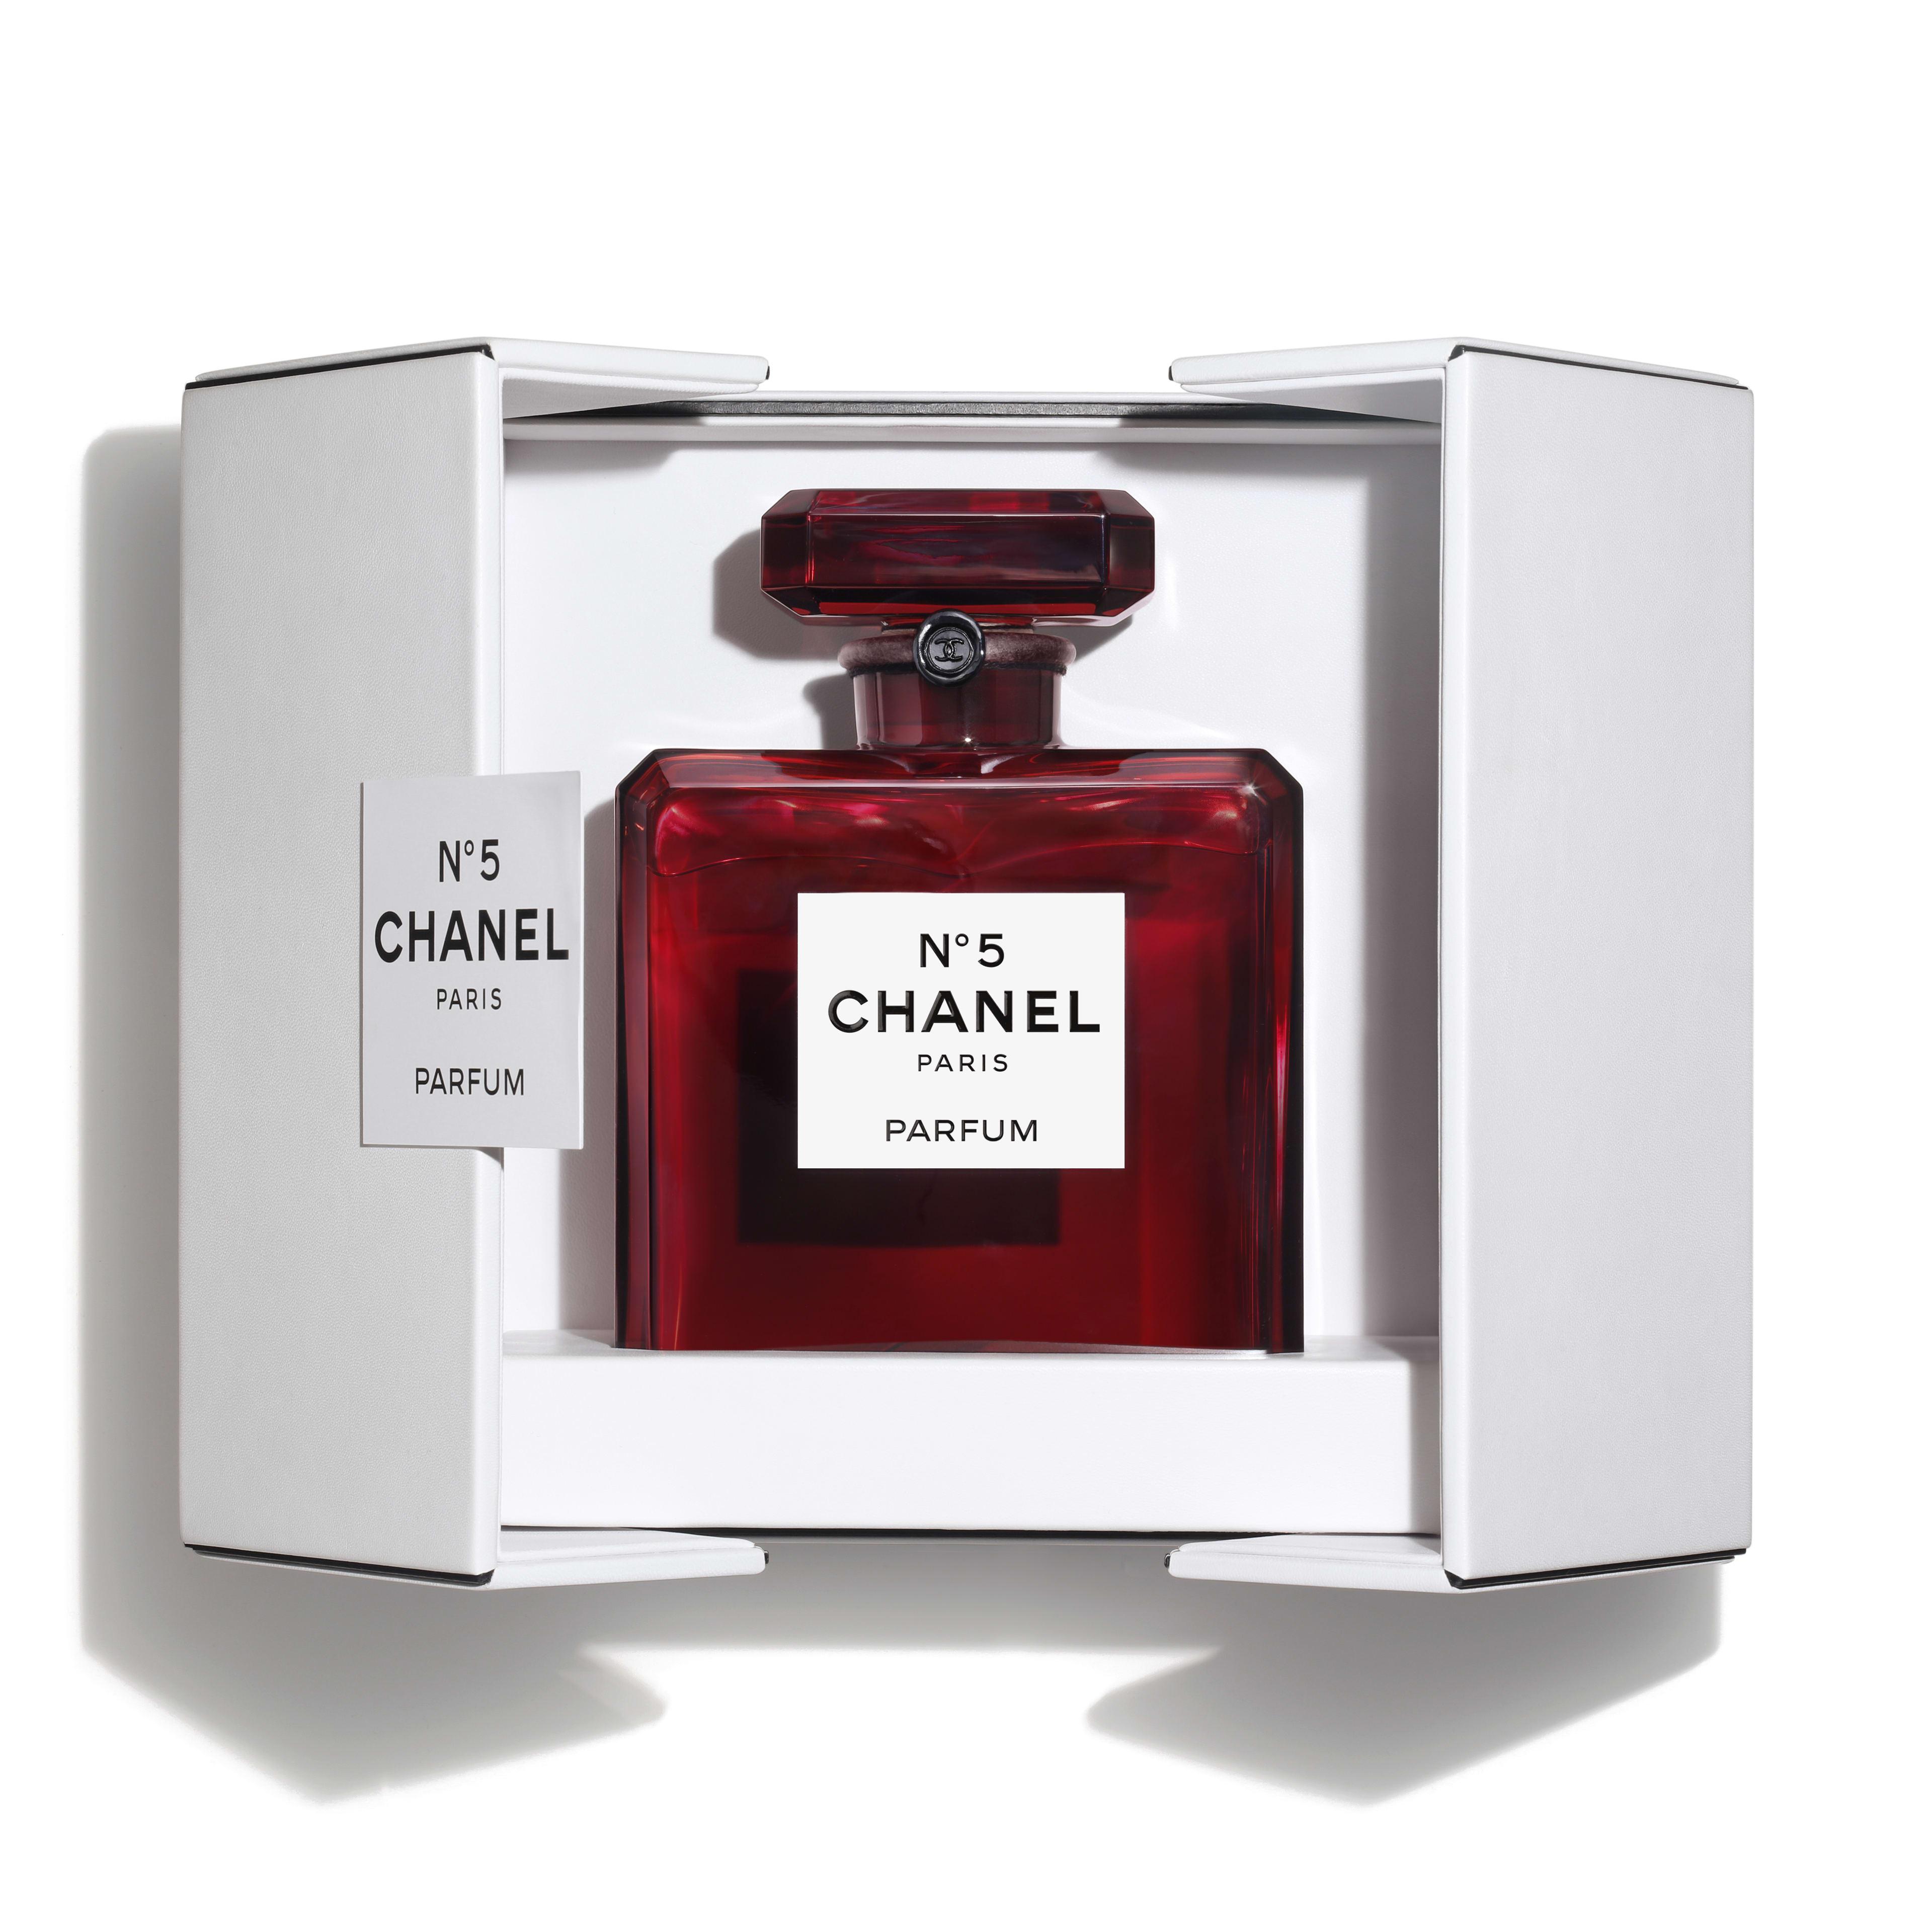 chanel-n-5-limited-edition-grand-extrait-packshot-default-120677-8810658168862.jpg